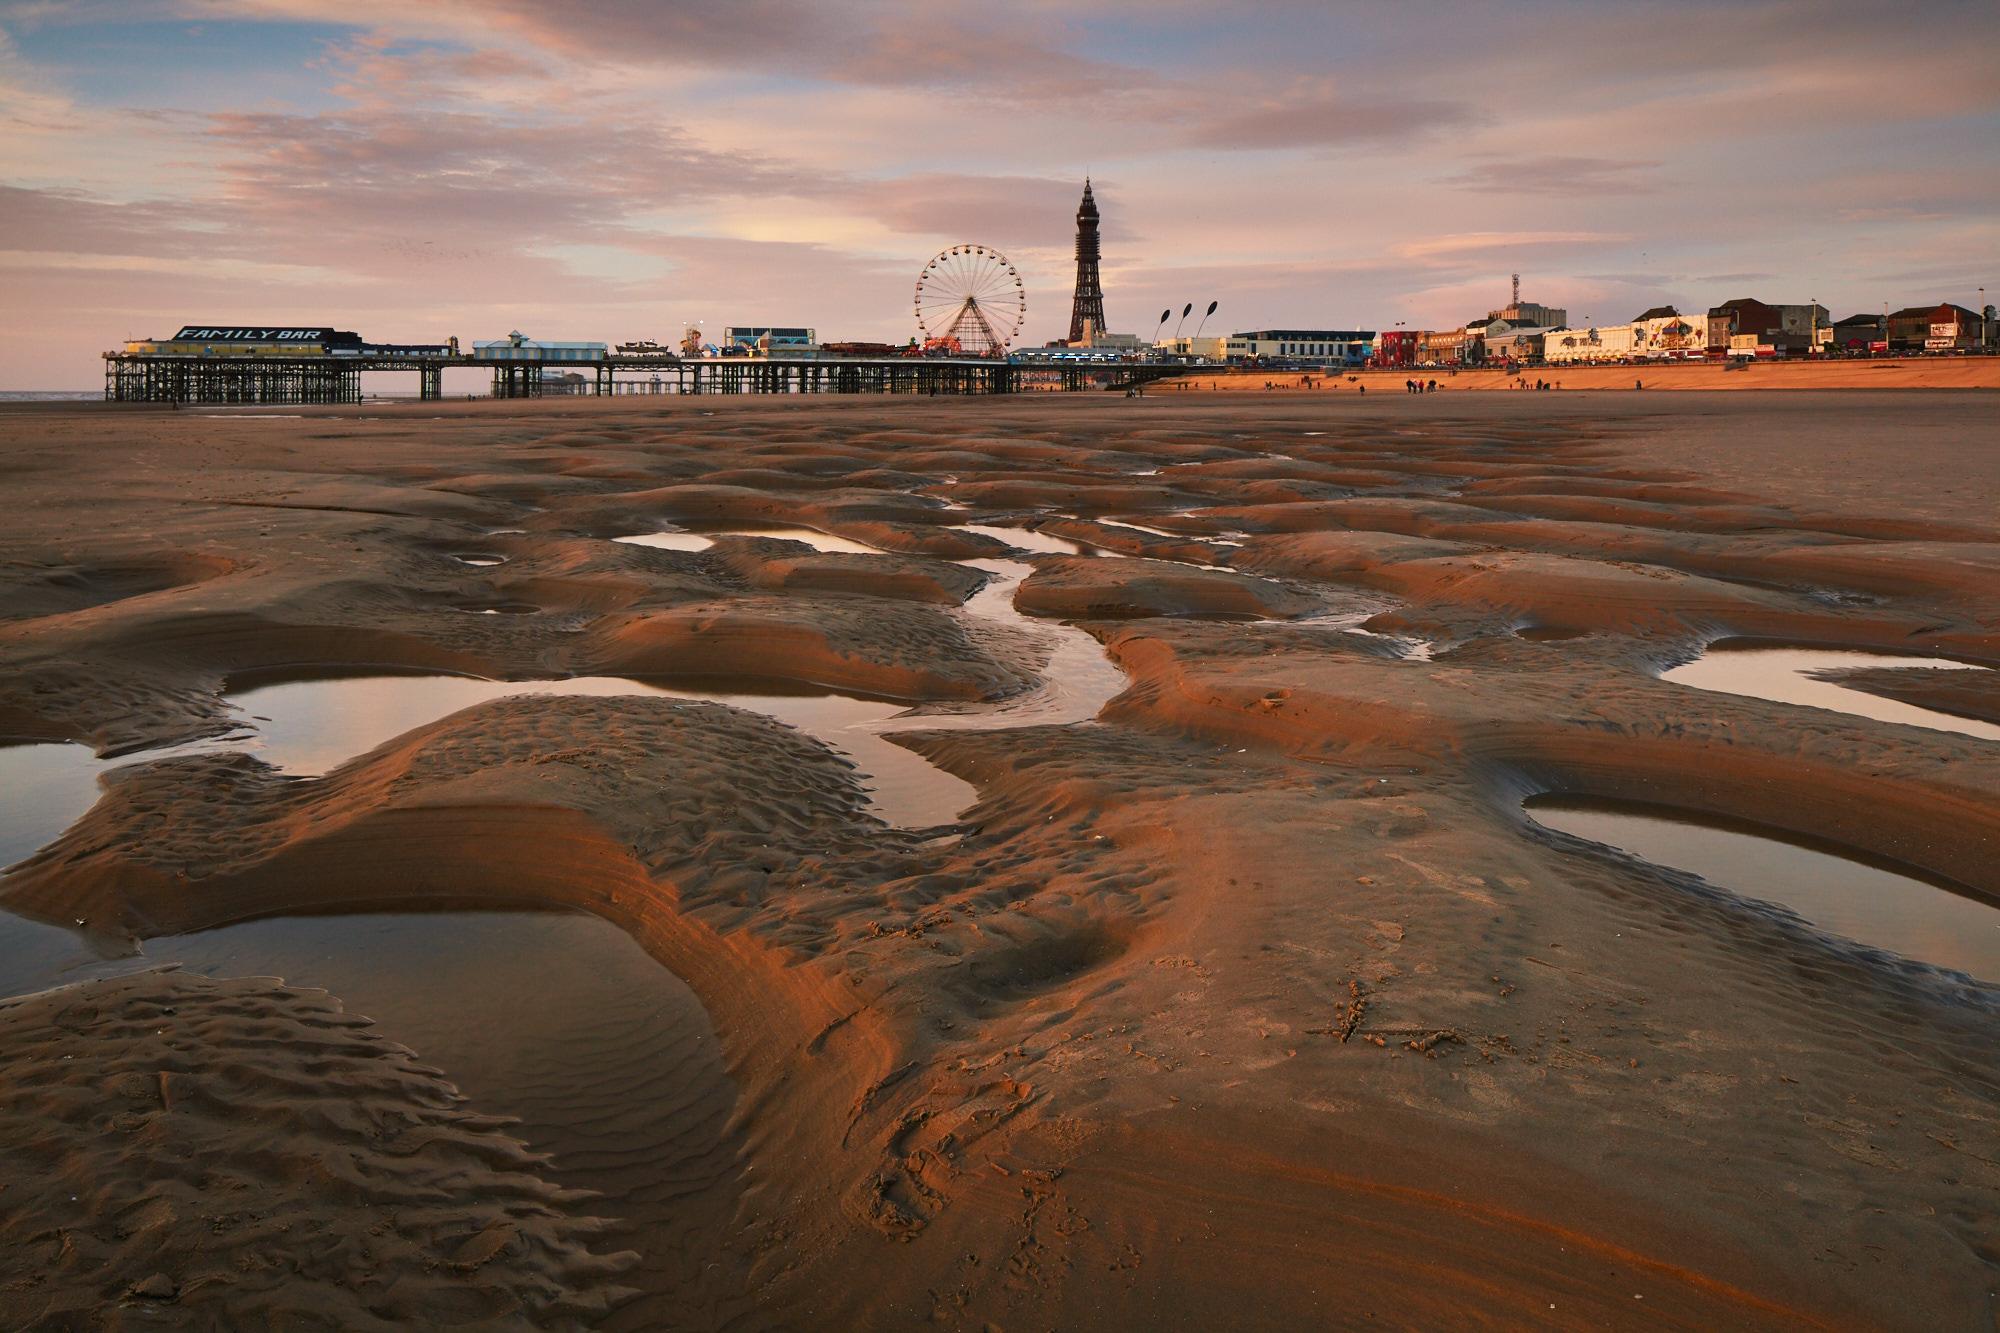 Playground, Blackpool, Lancashire, England